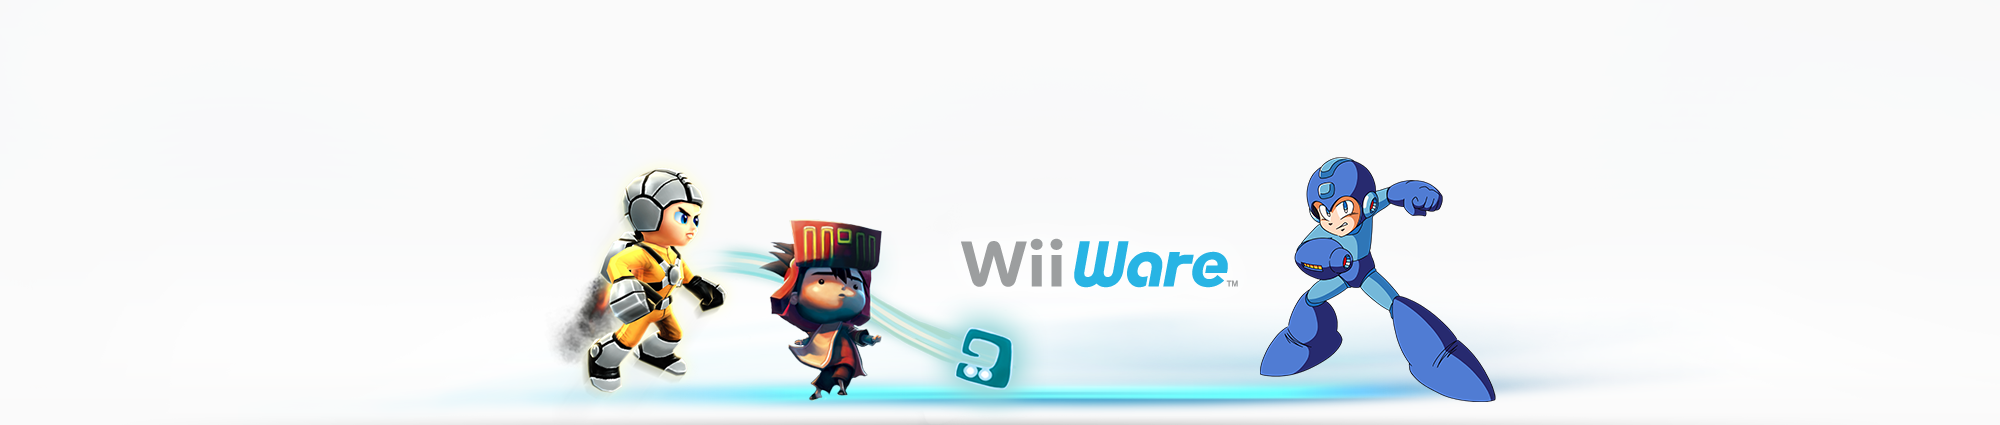 Battleborn - WiiWare